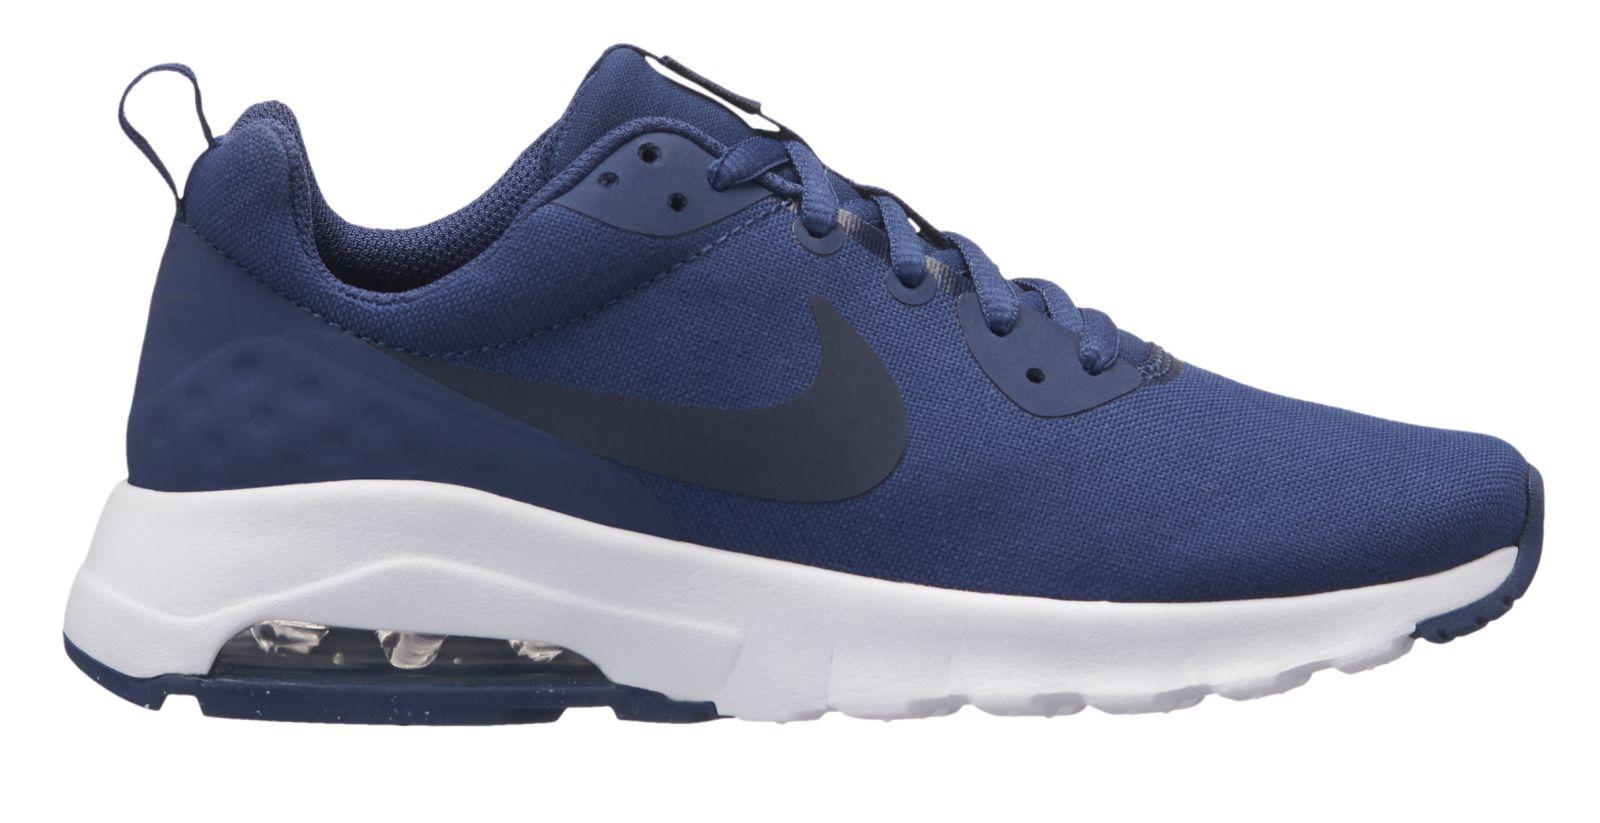 07f6a2f25bda Nike Kinder Fitness-und Freizeit Schuh AIR MAX MOTION LW SE GS navy blau